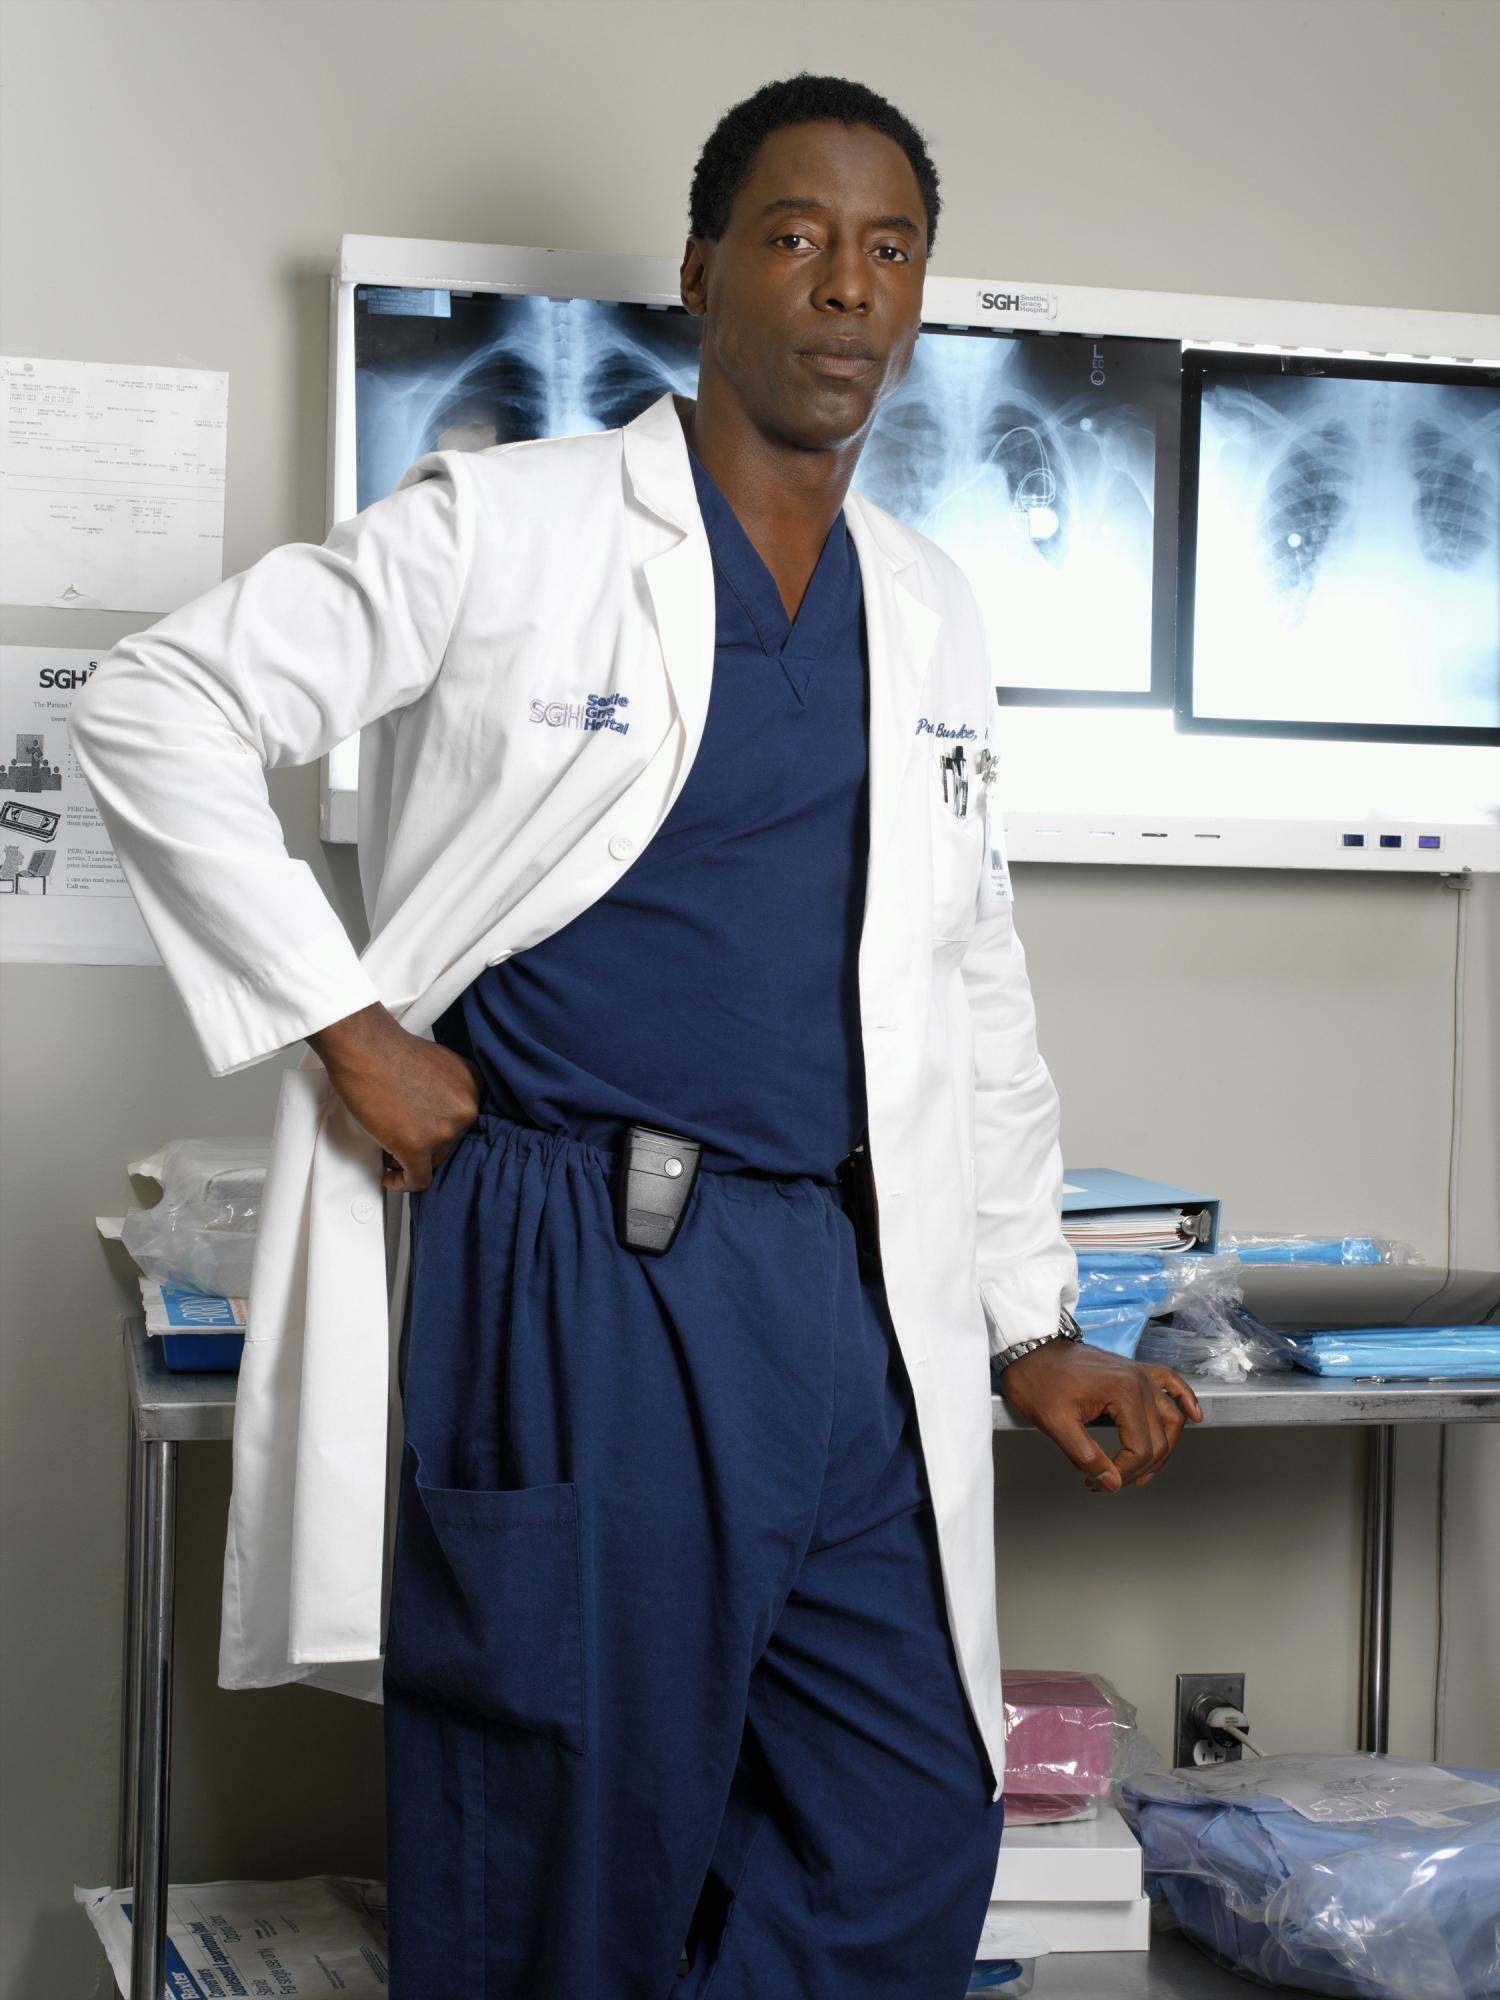 Grey\'s Anatomy - Season 2 Promo   Grey\'s Anatomy   Pinterest   Anatomy